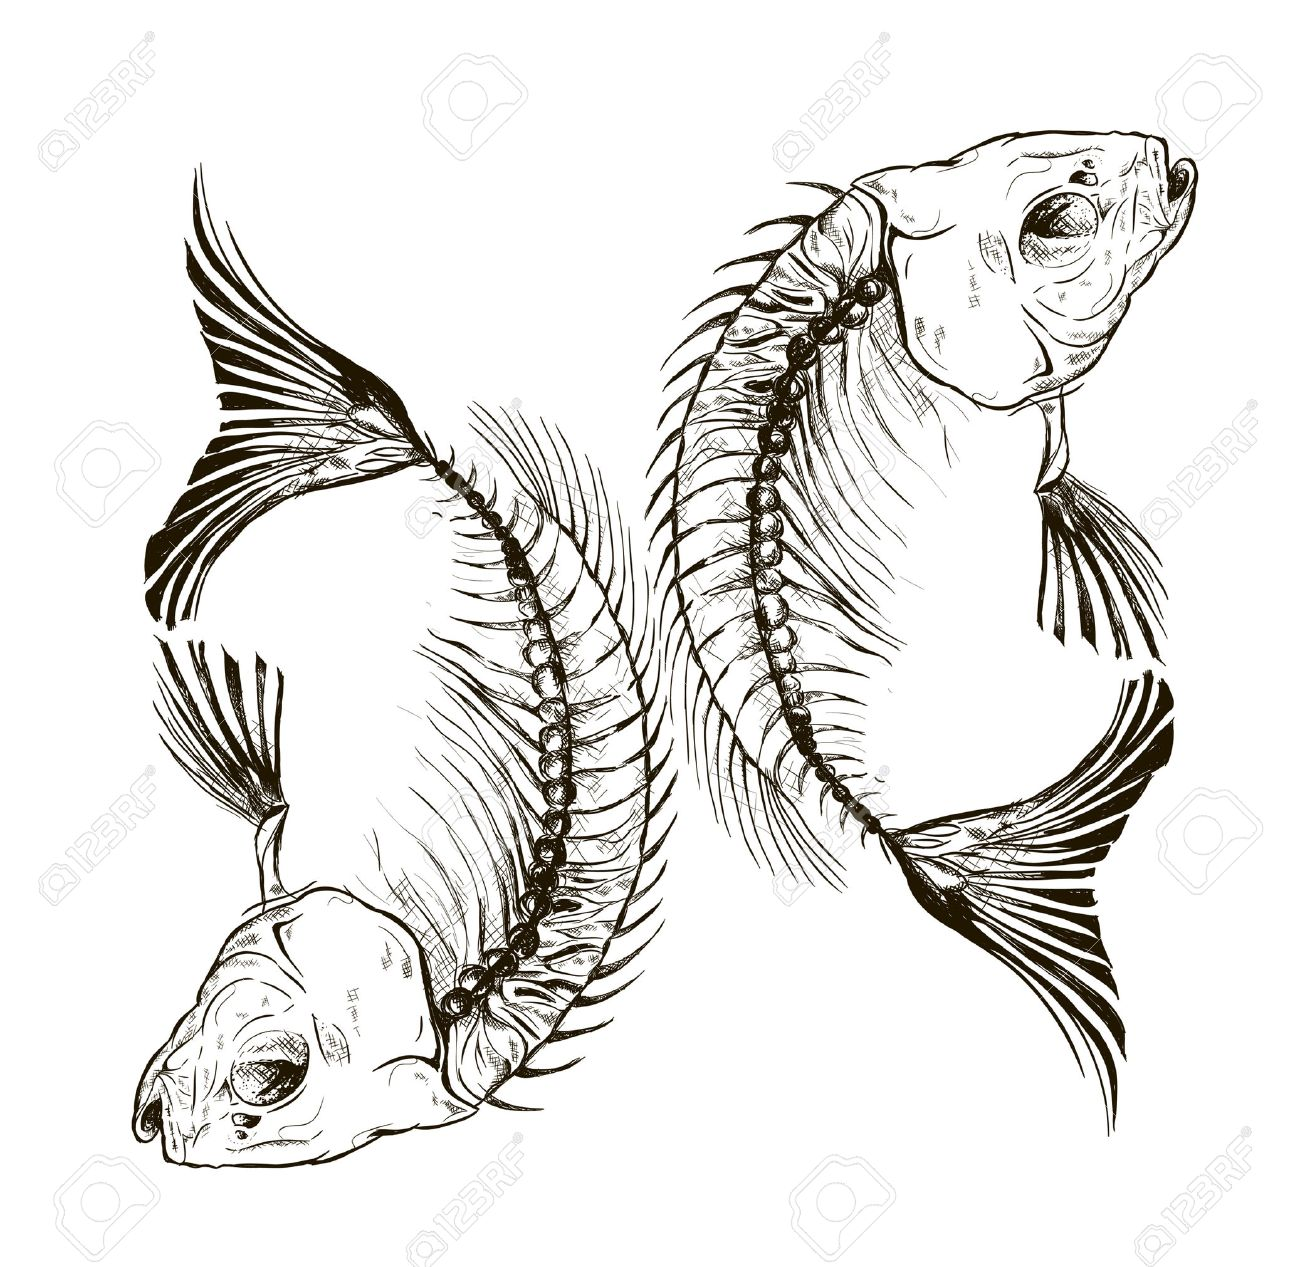 Vector fish skeleton, a talisman, a sign Stock Vector - 43775943